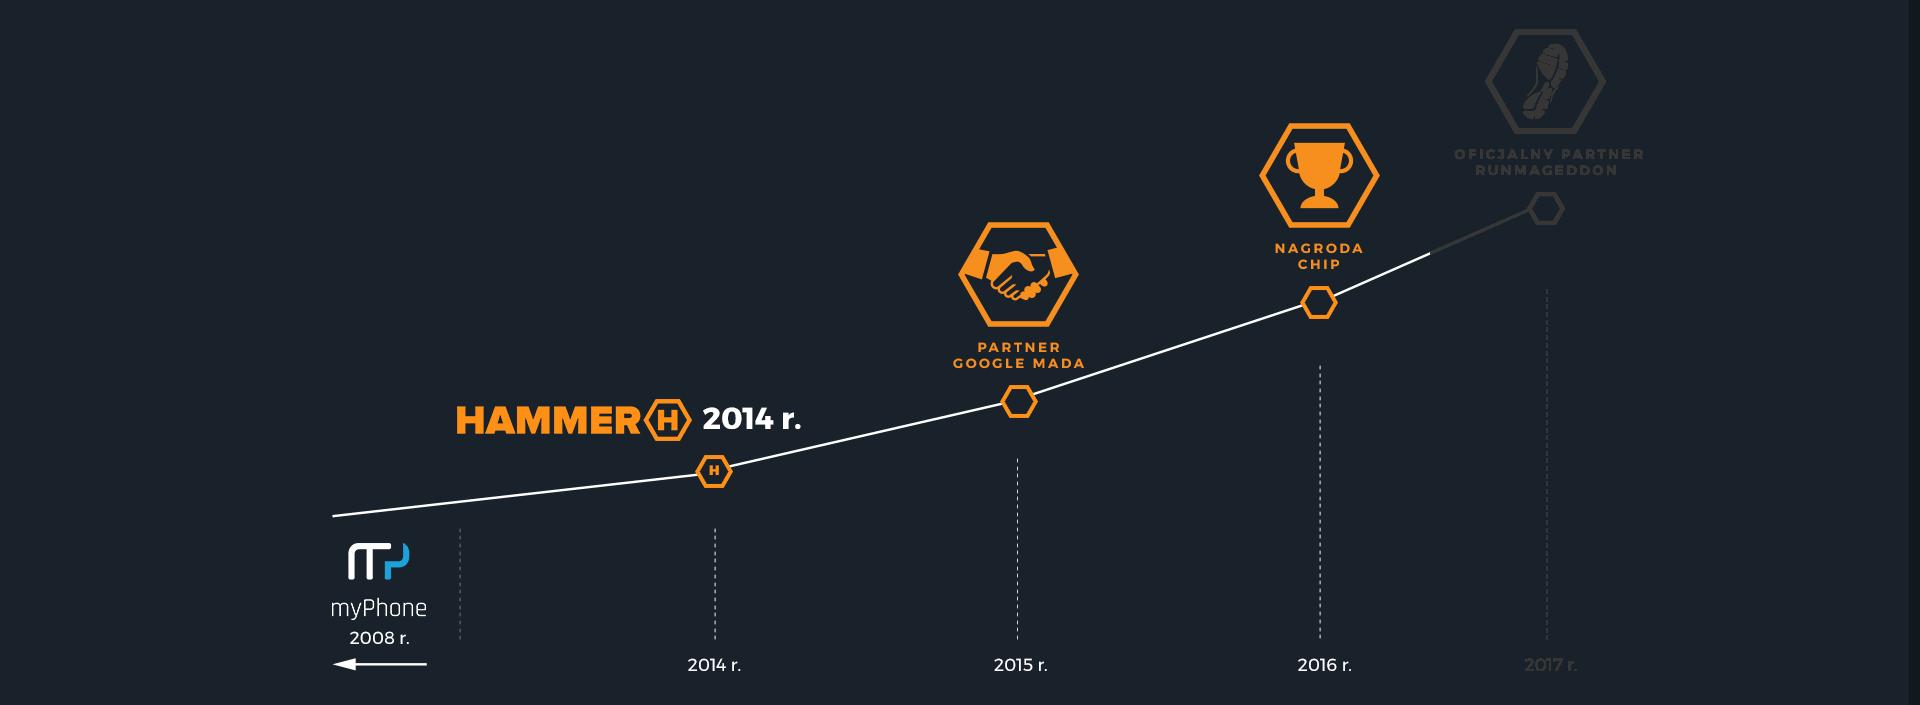 Ano 2016